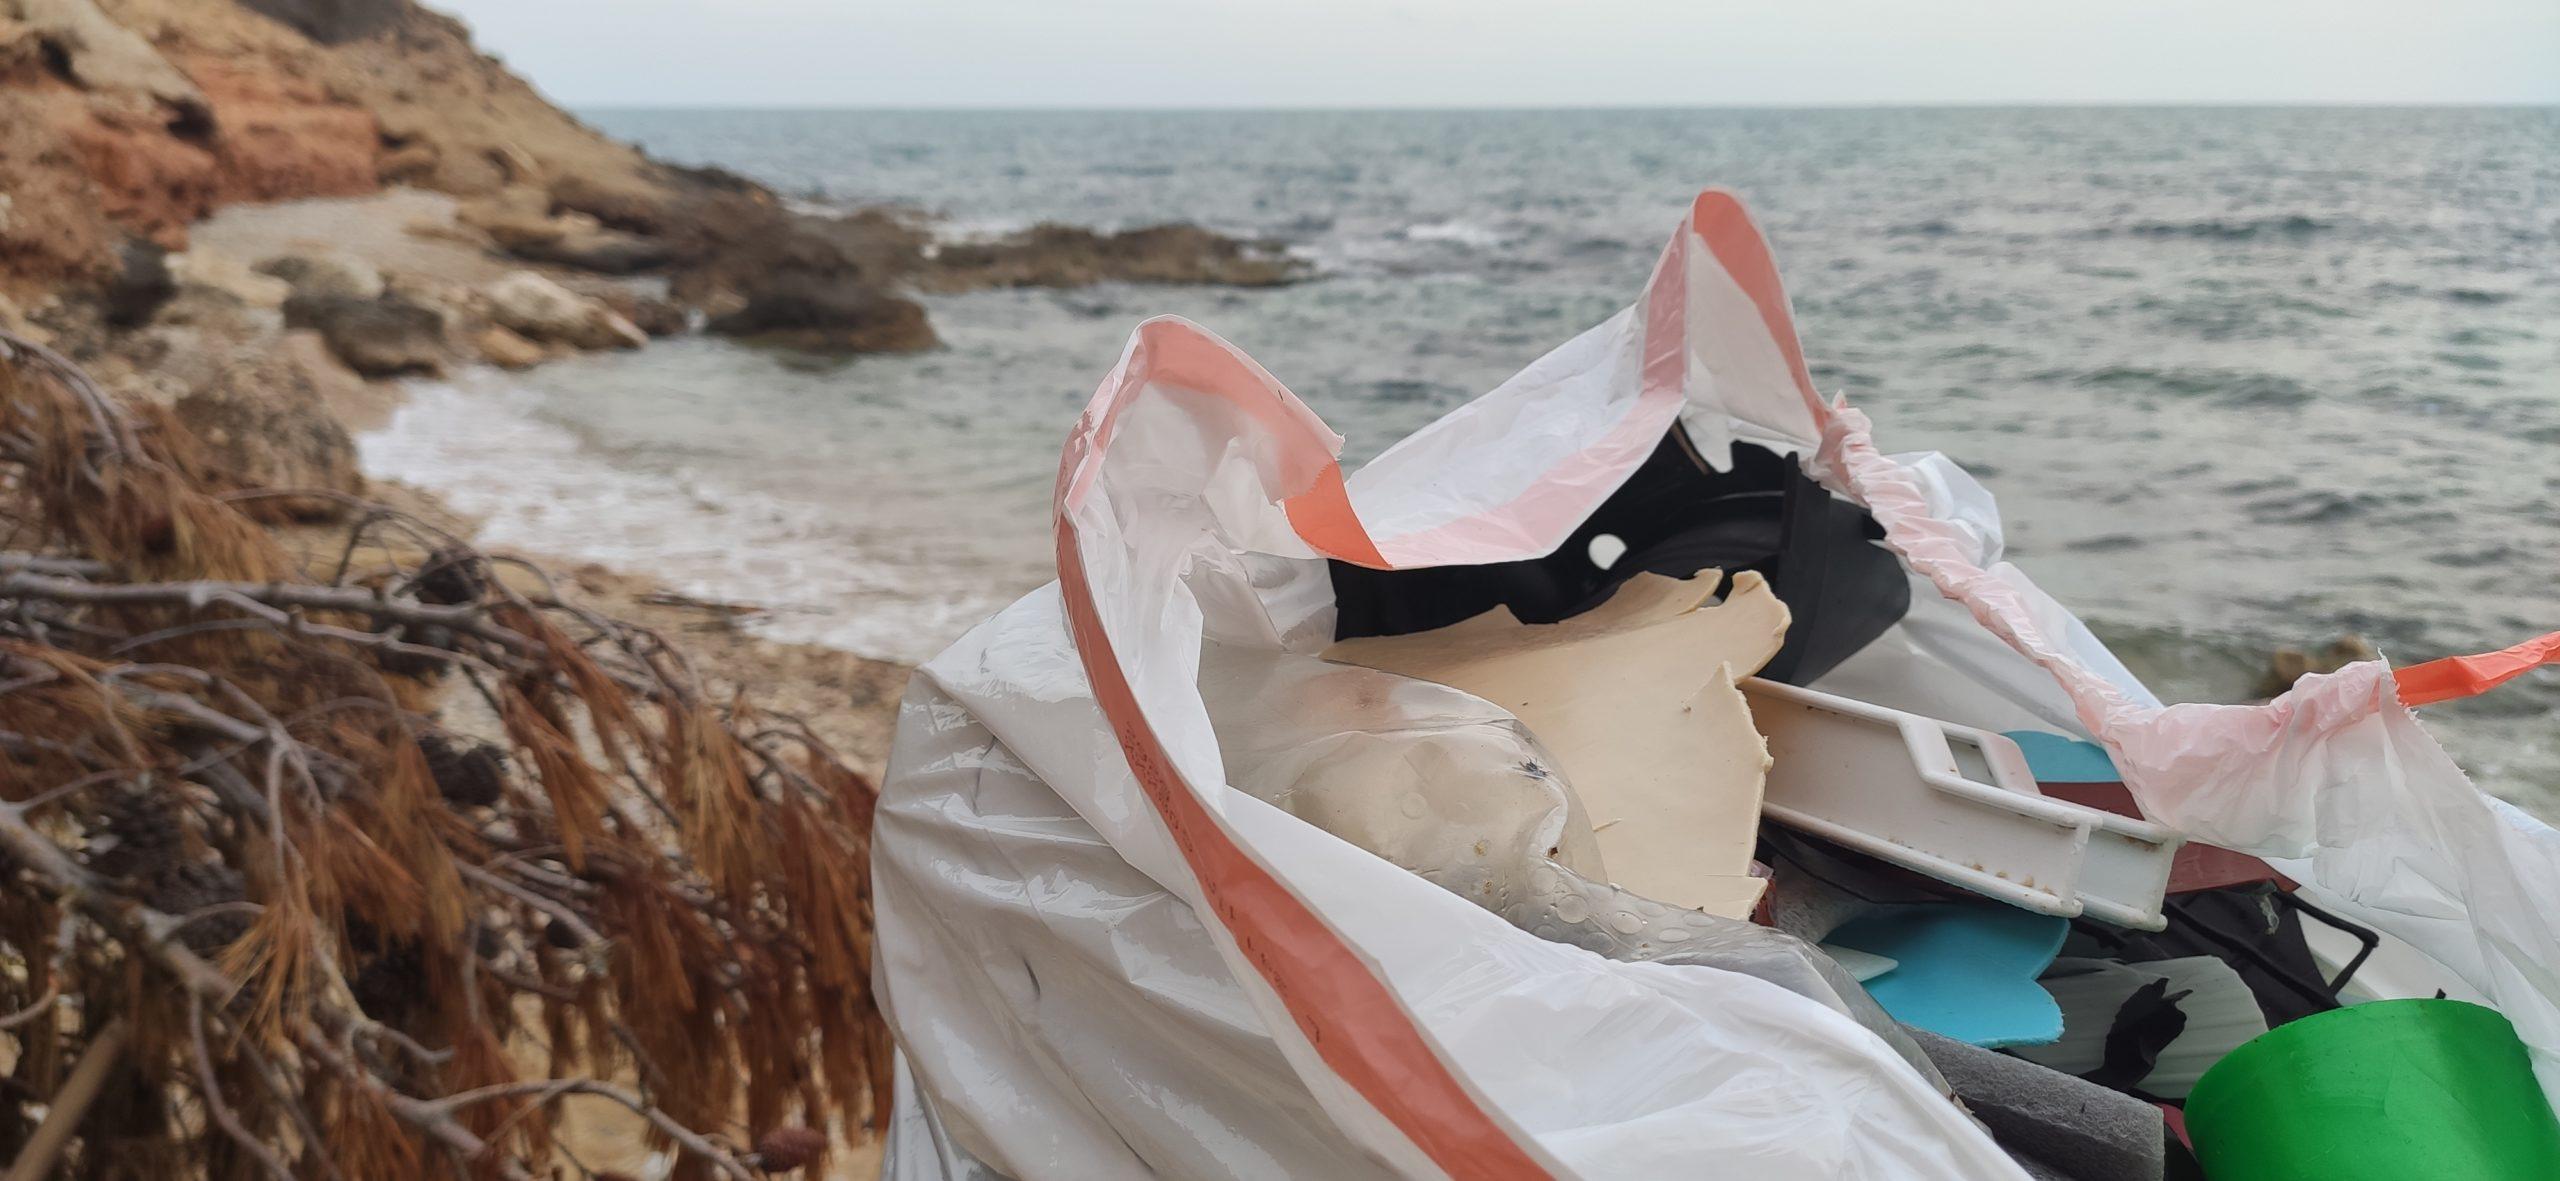 plastic waste beach7